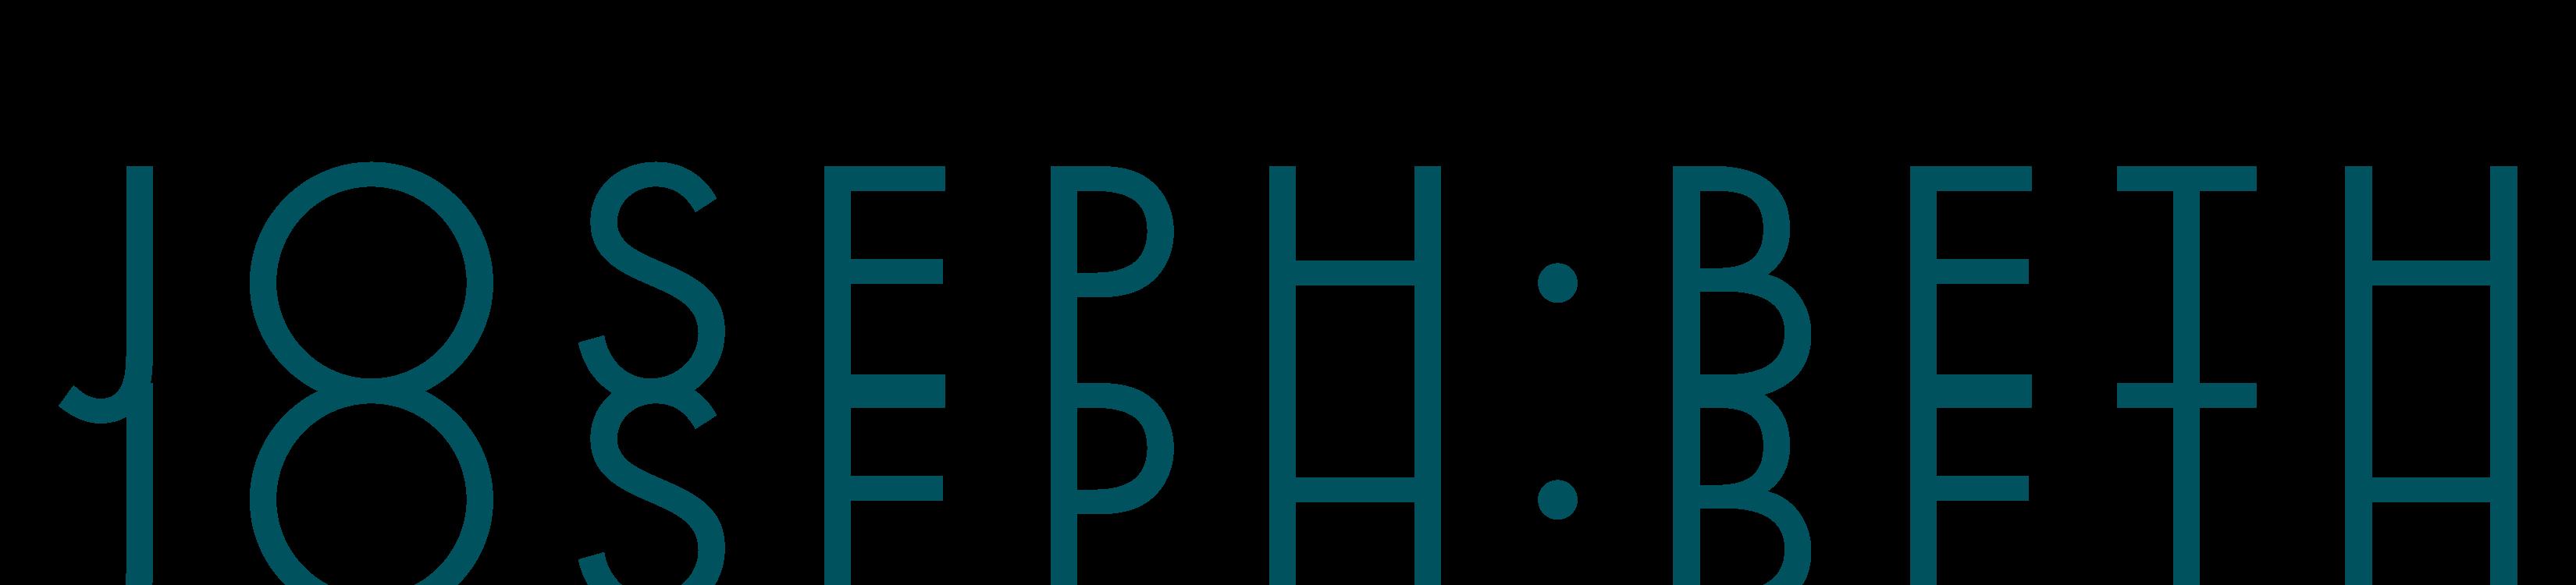 JosephBeth_logo